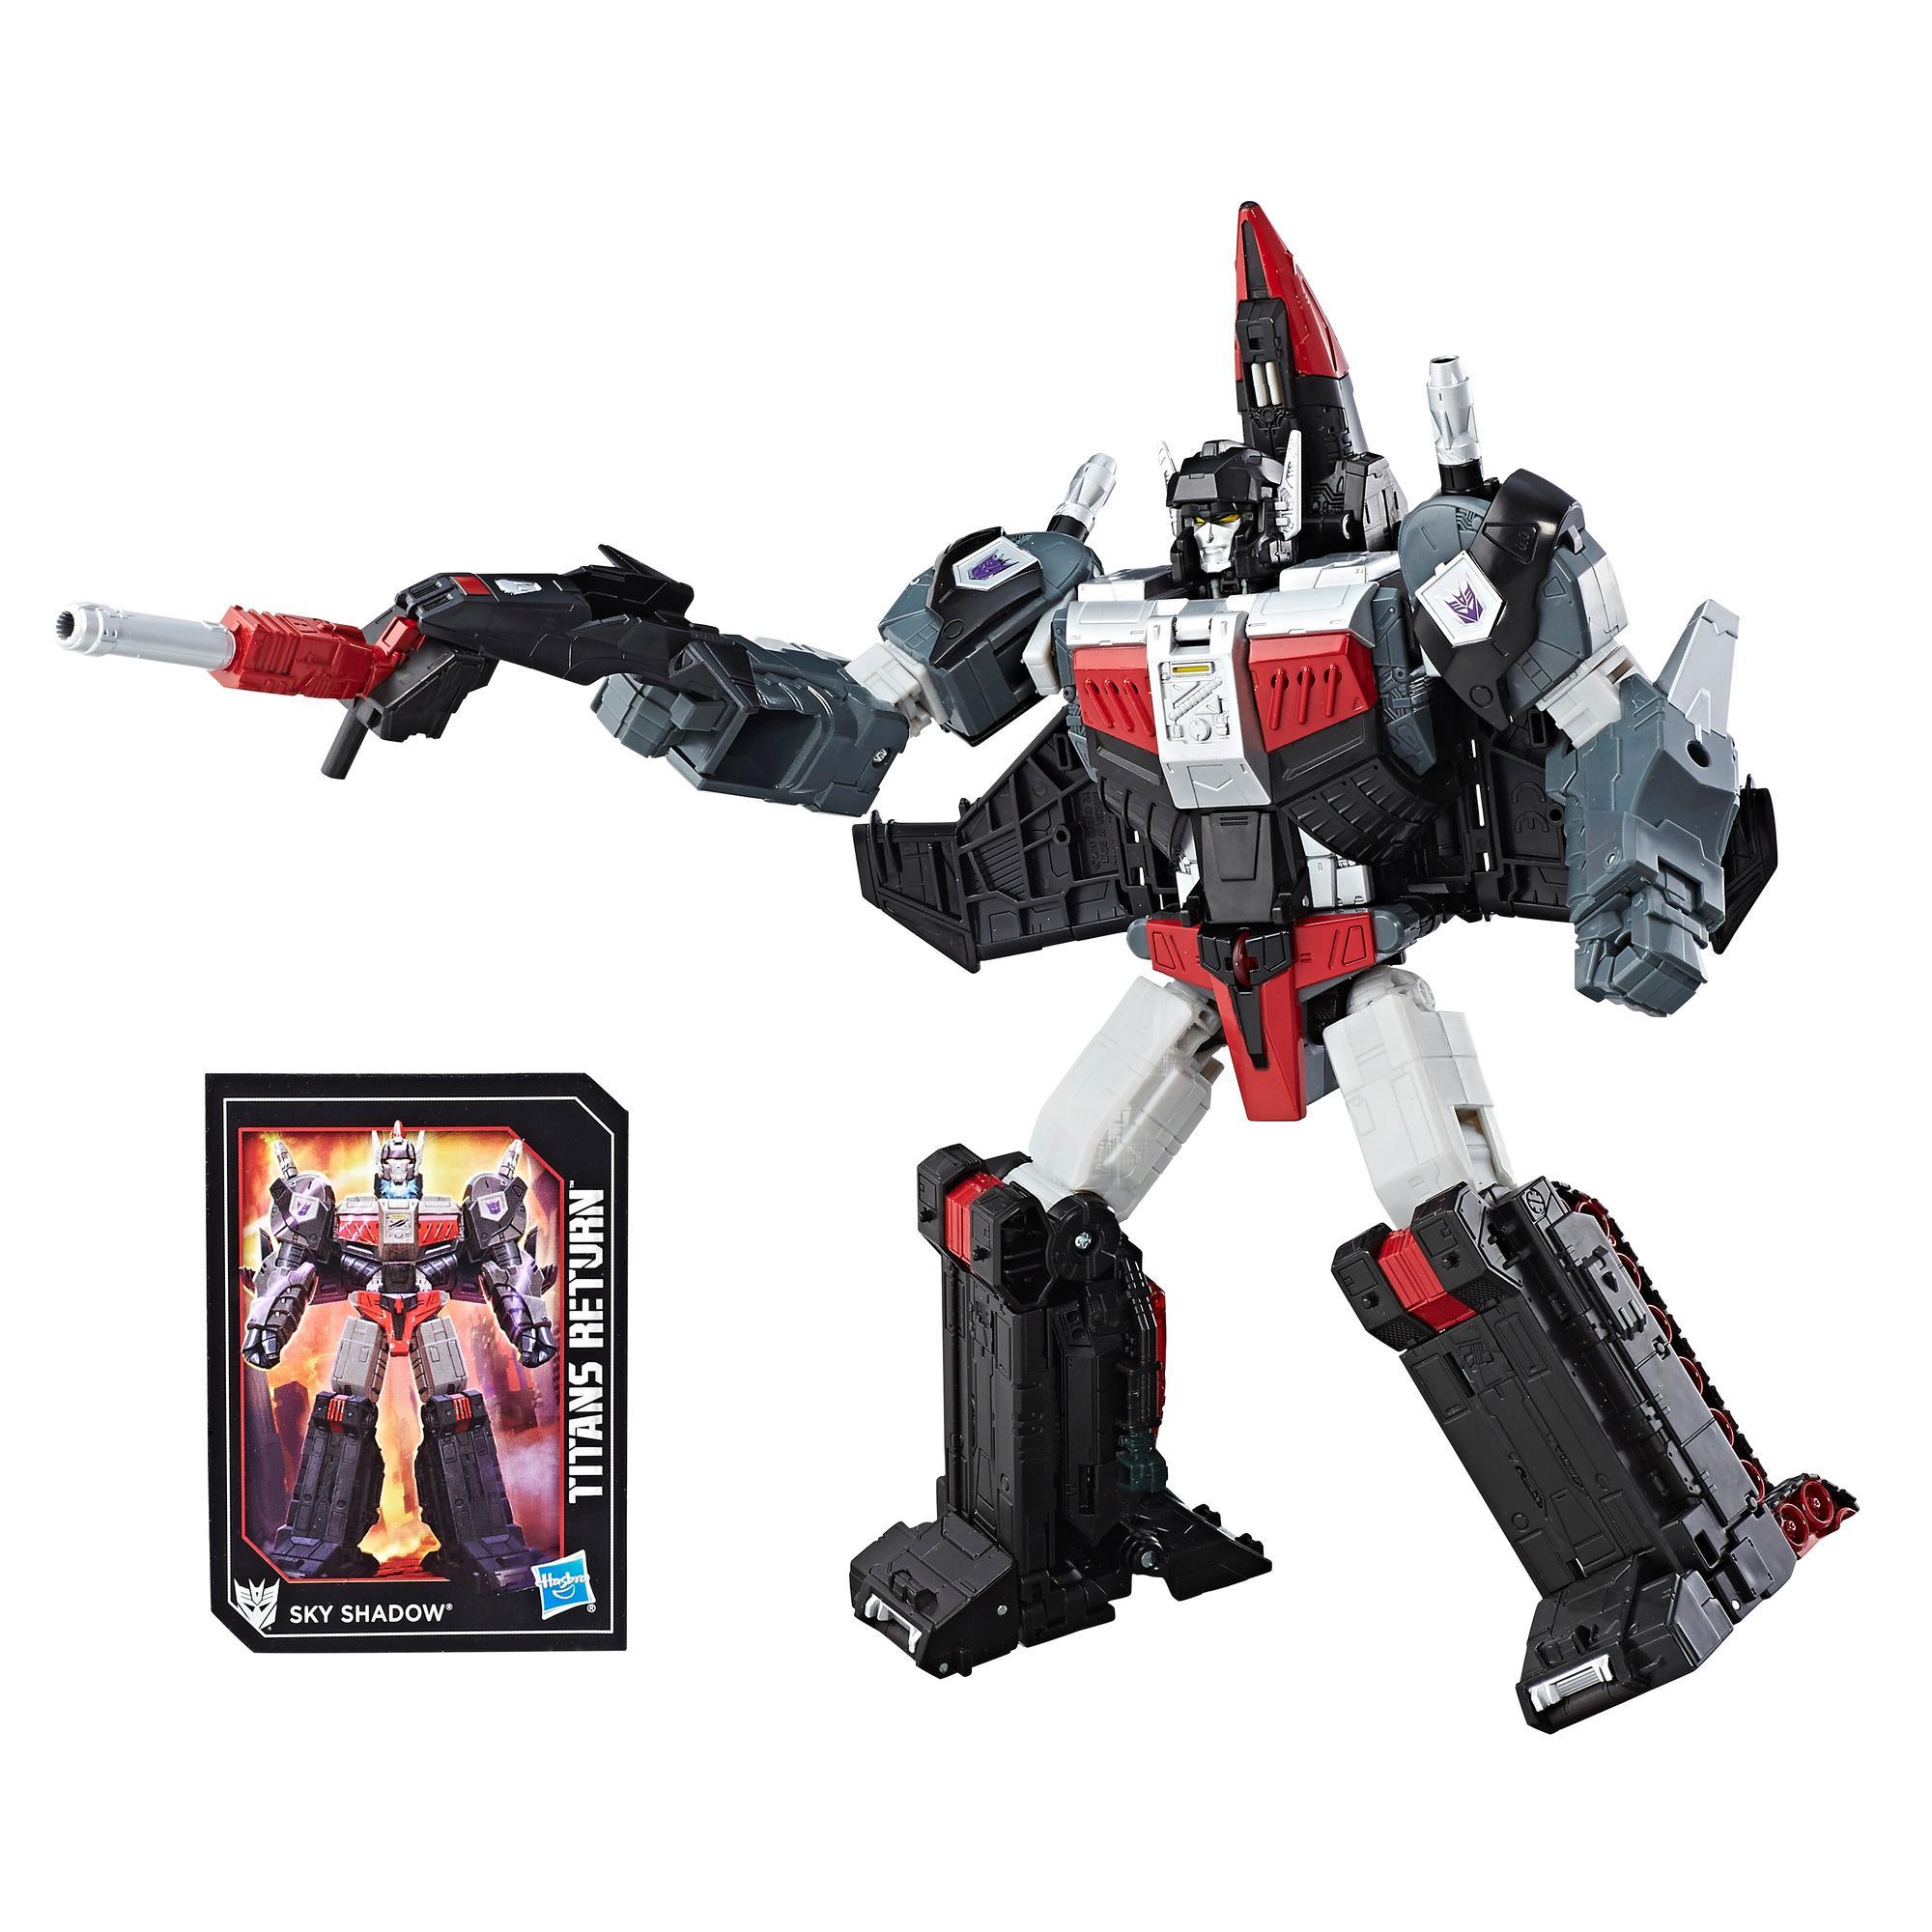 Transformers Generation Titan Returns Leader SKY SHADOW